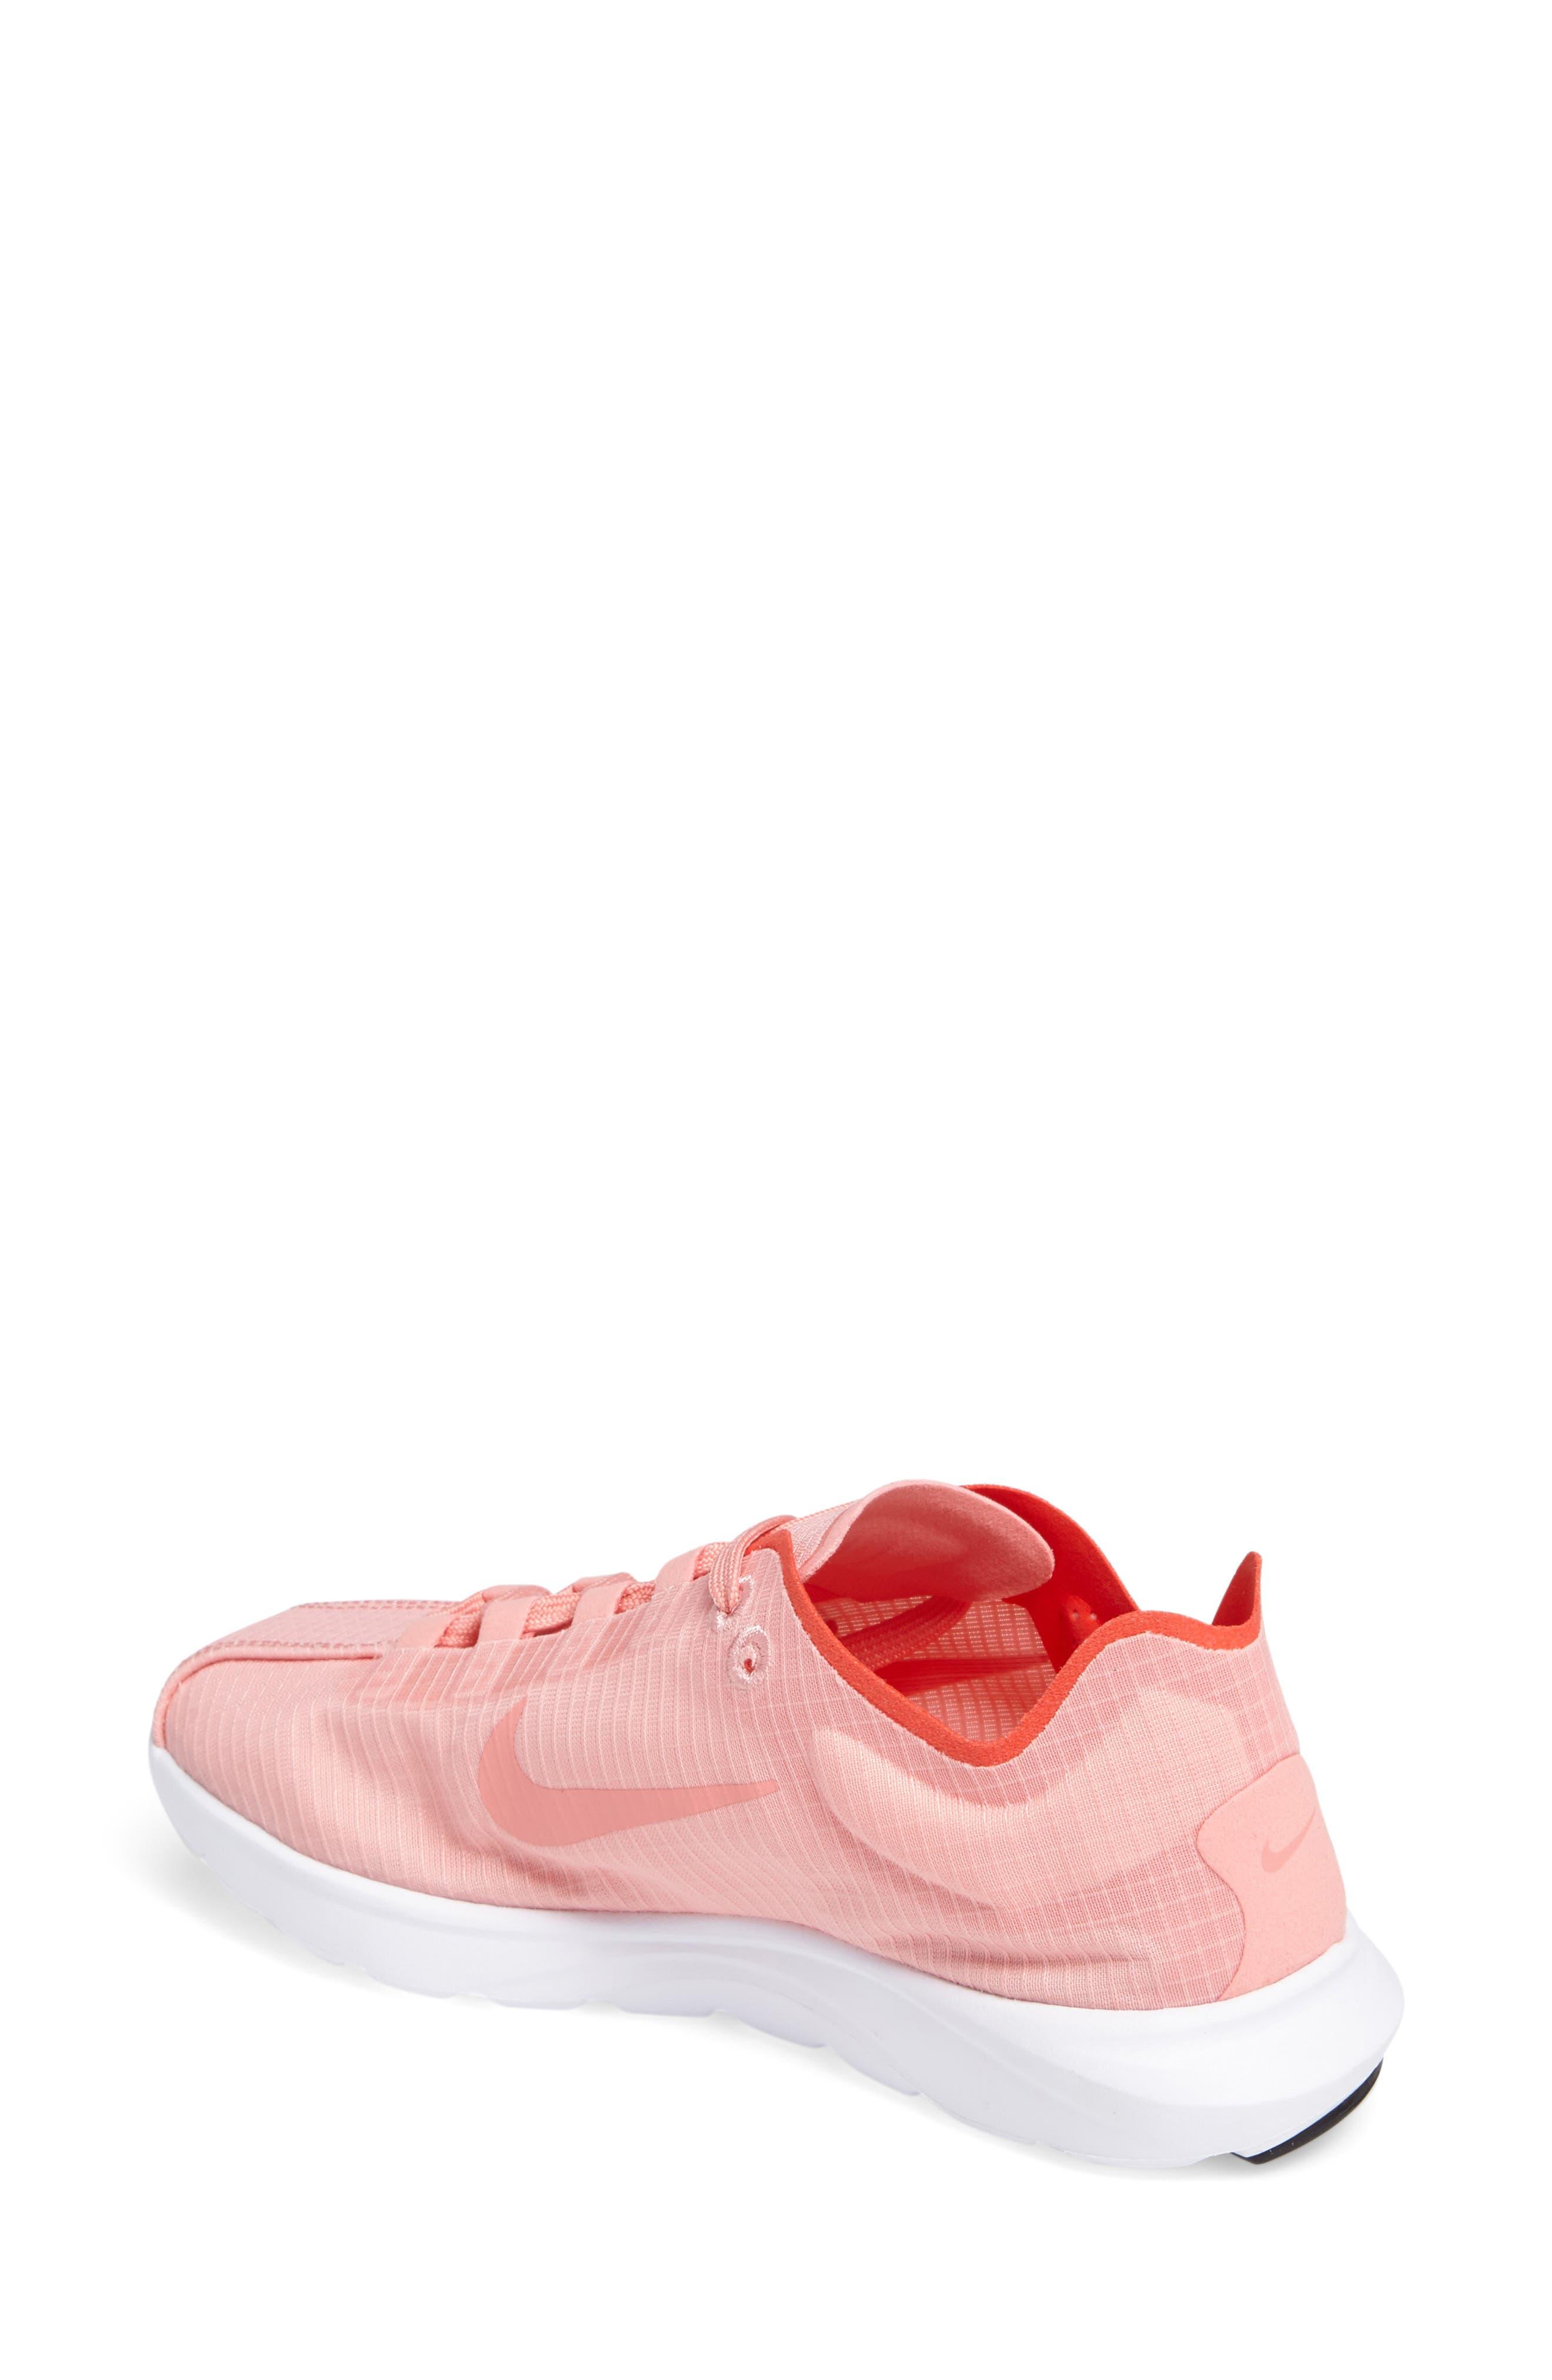 Alternate Image 2  - Nike Mayfly Lite SE Sneaker (Women)